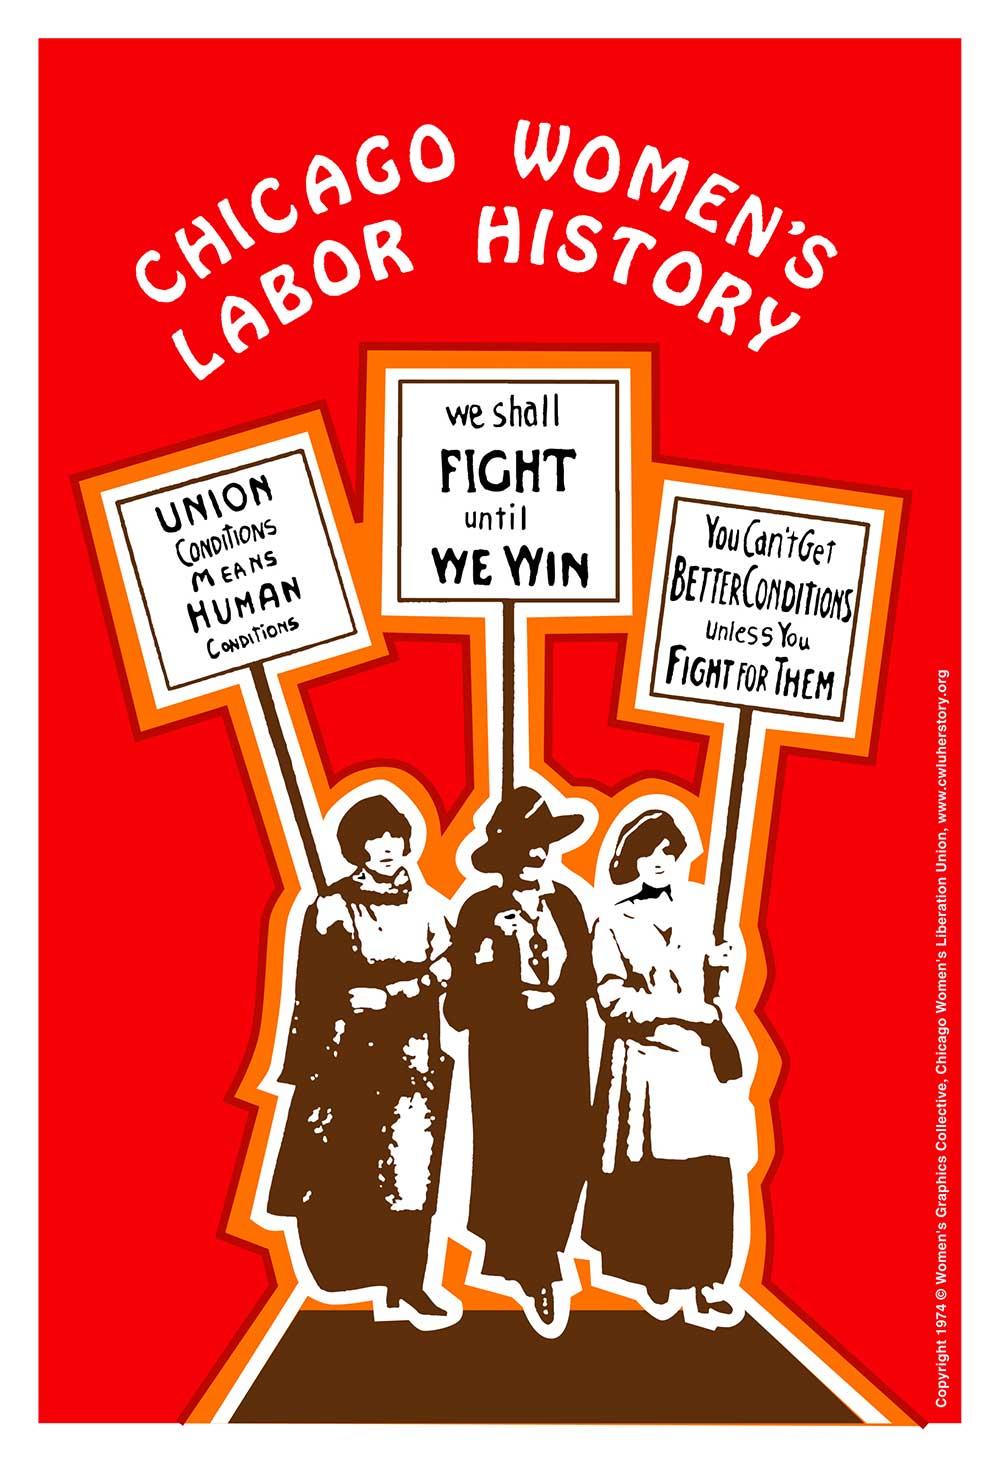 Chicago Women's Labor History